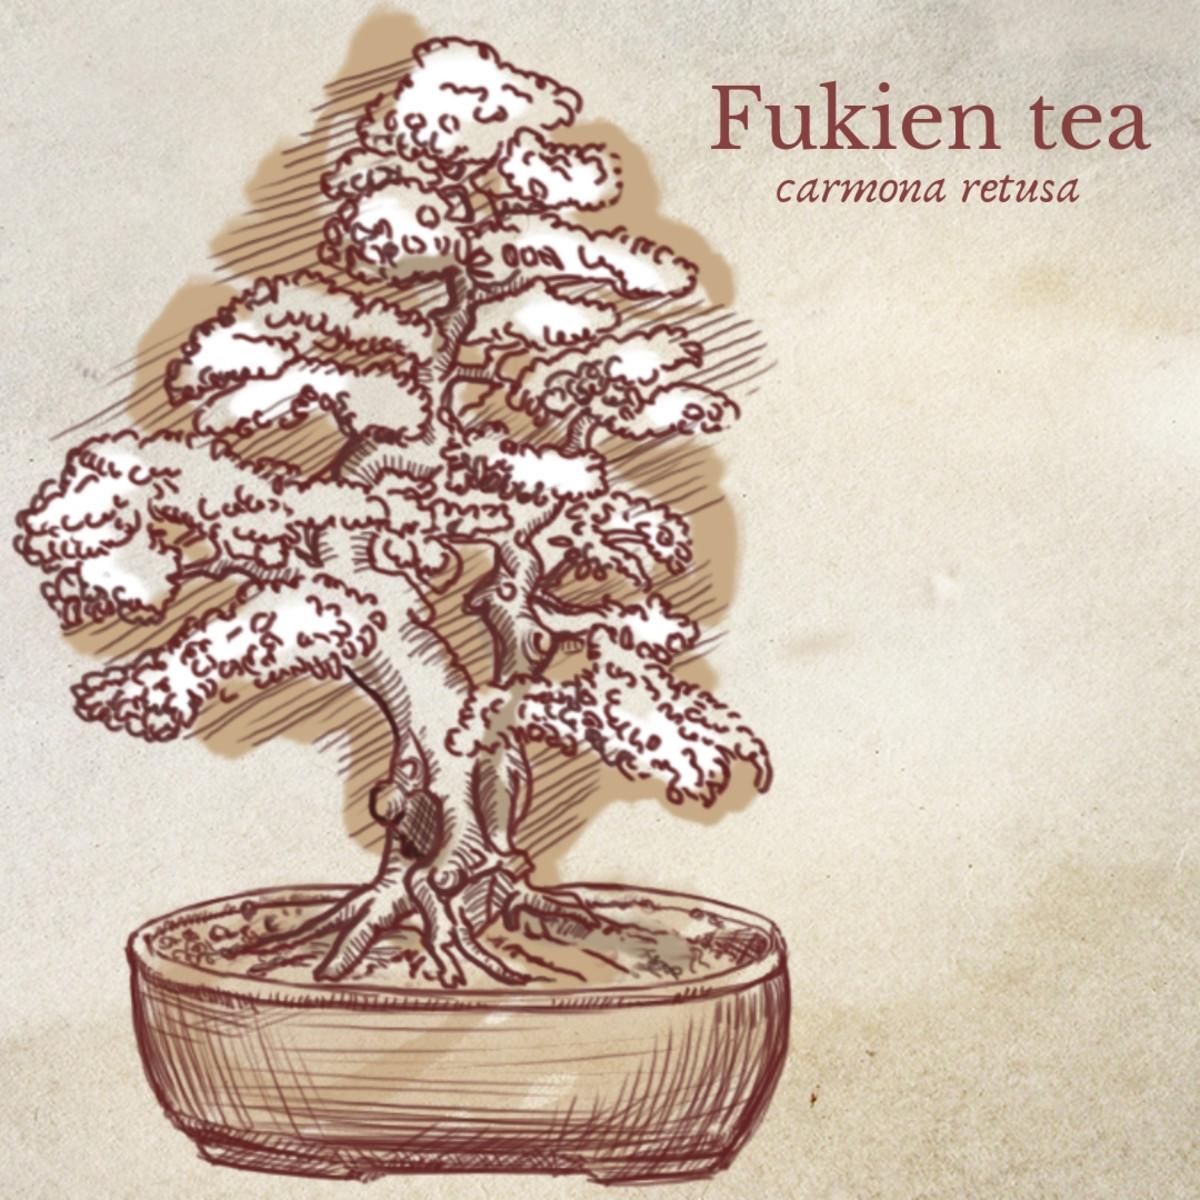 Illustration of Fukien Tea